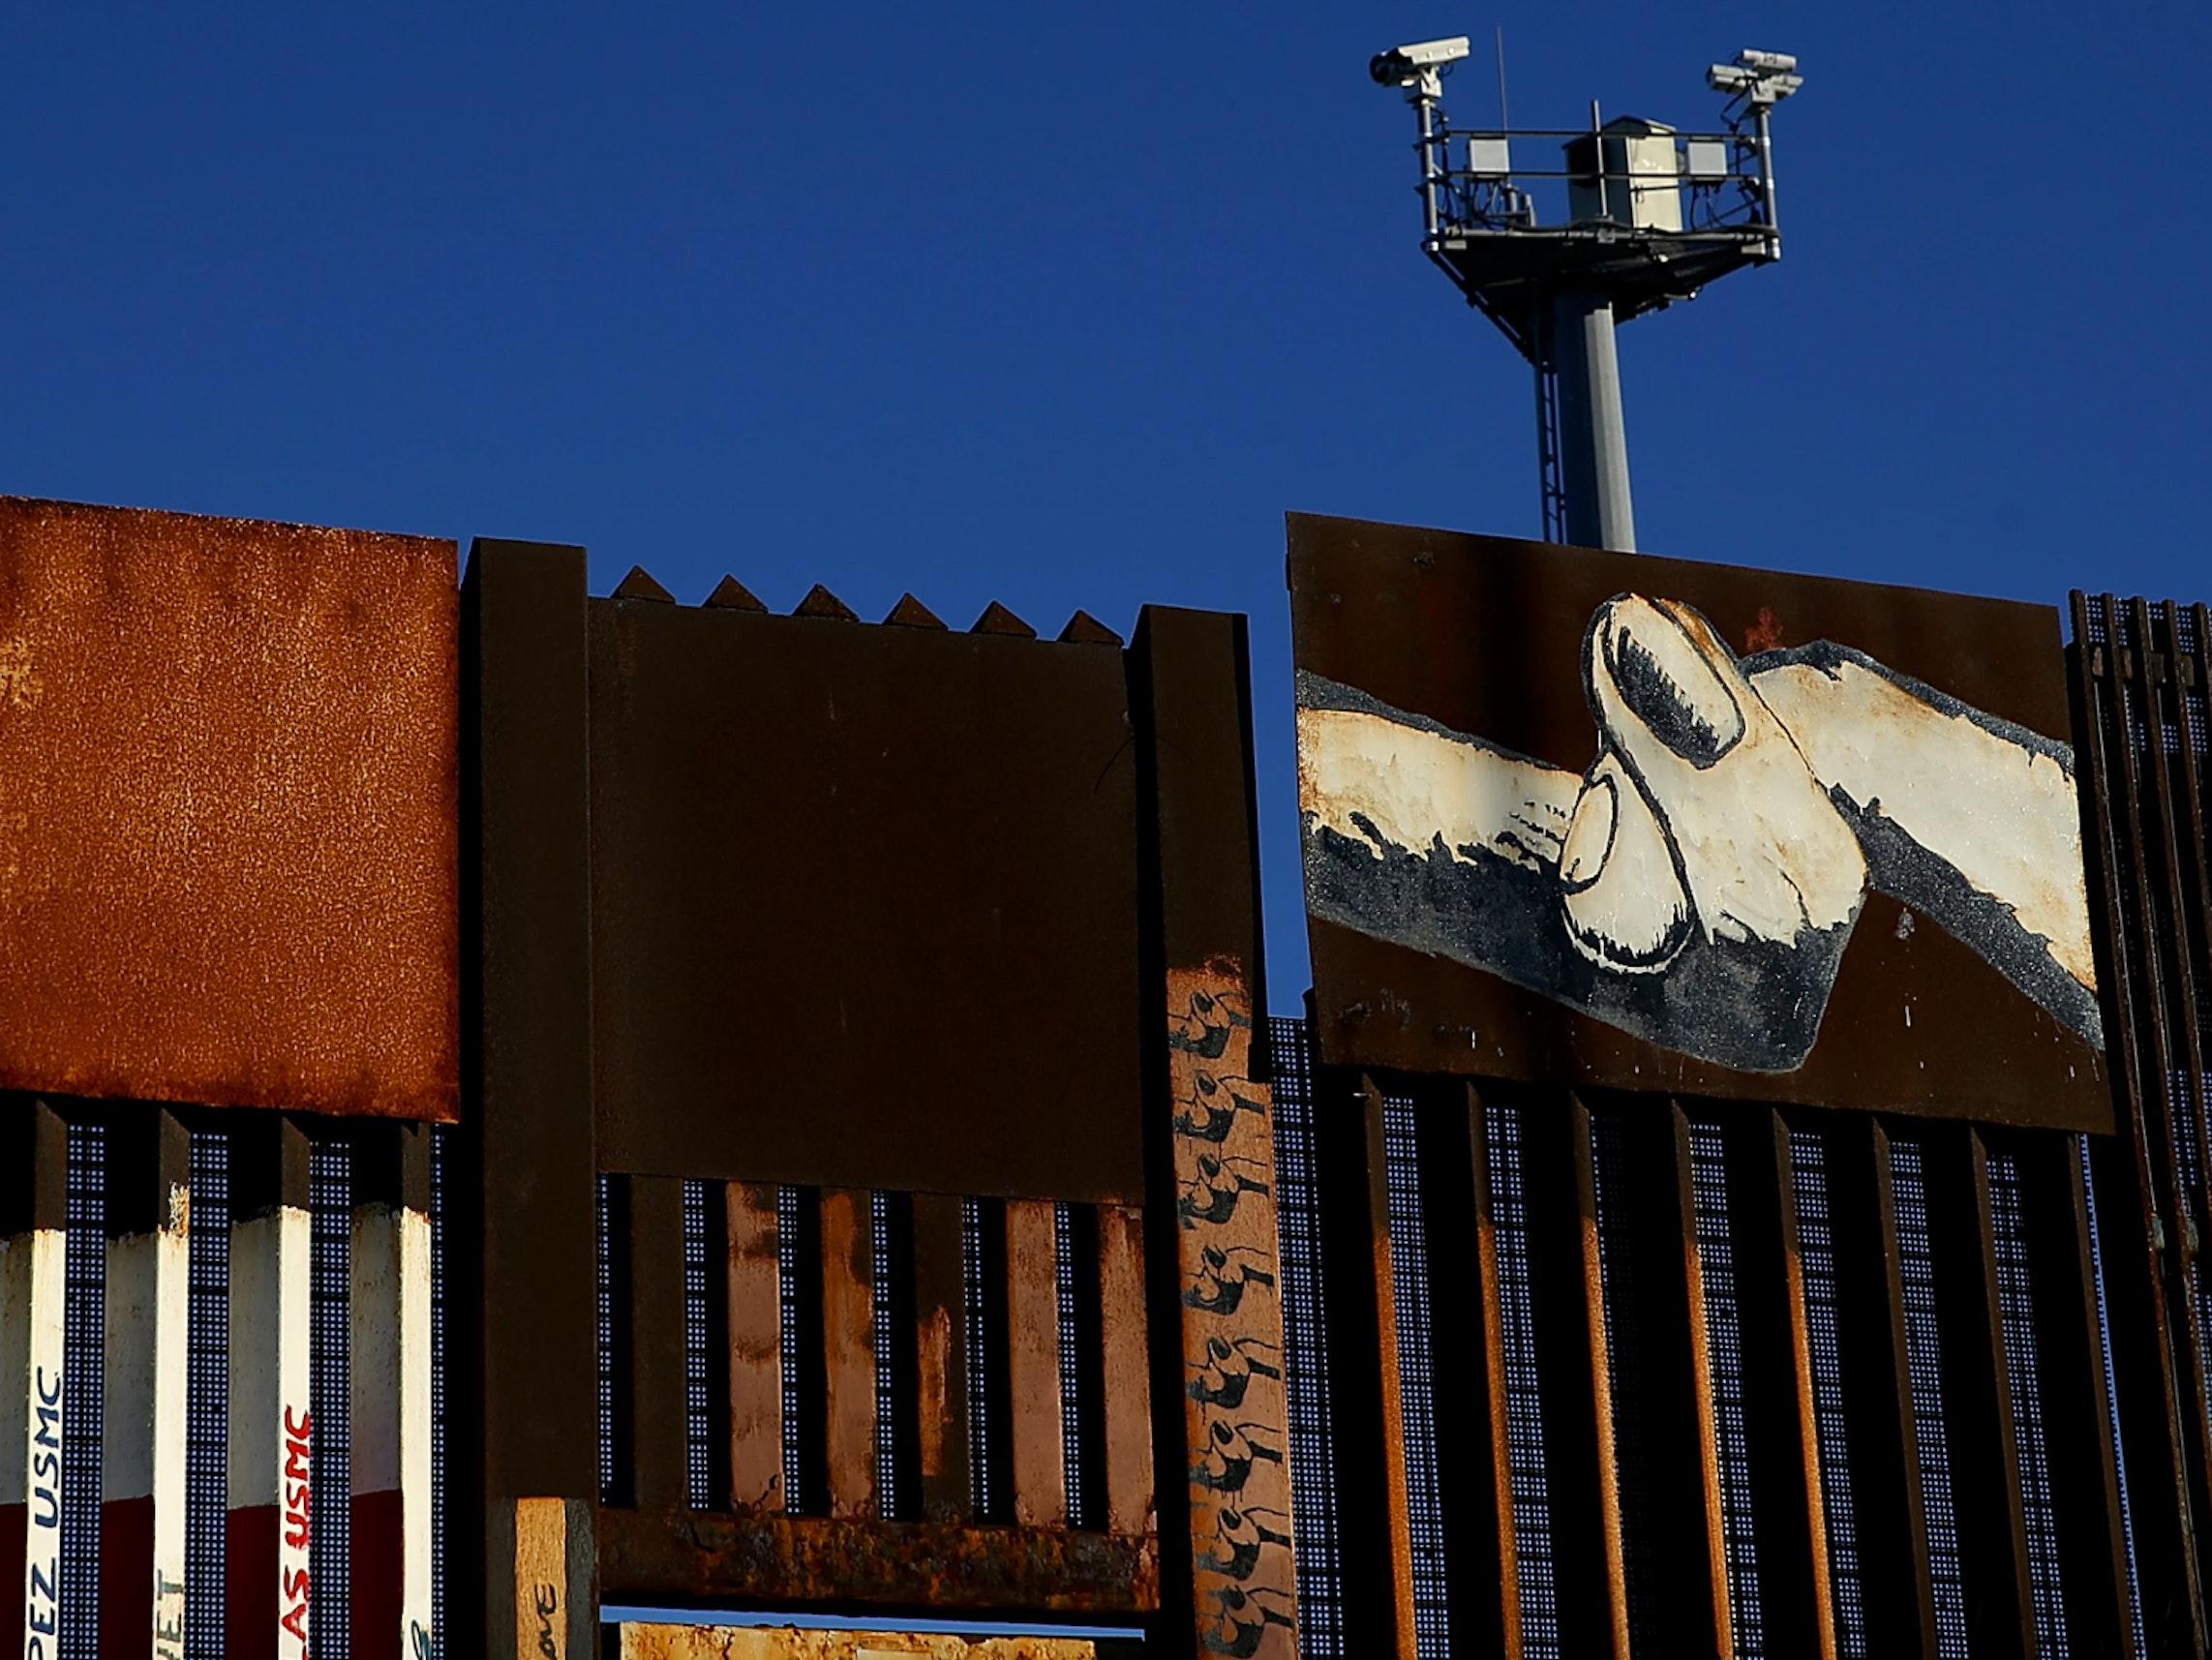 Trump's Wall Will Fail in the Era of Post-Humanism